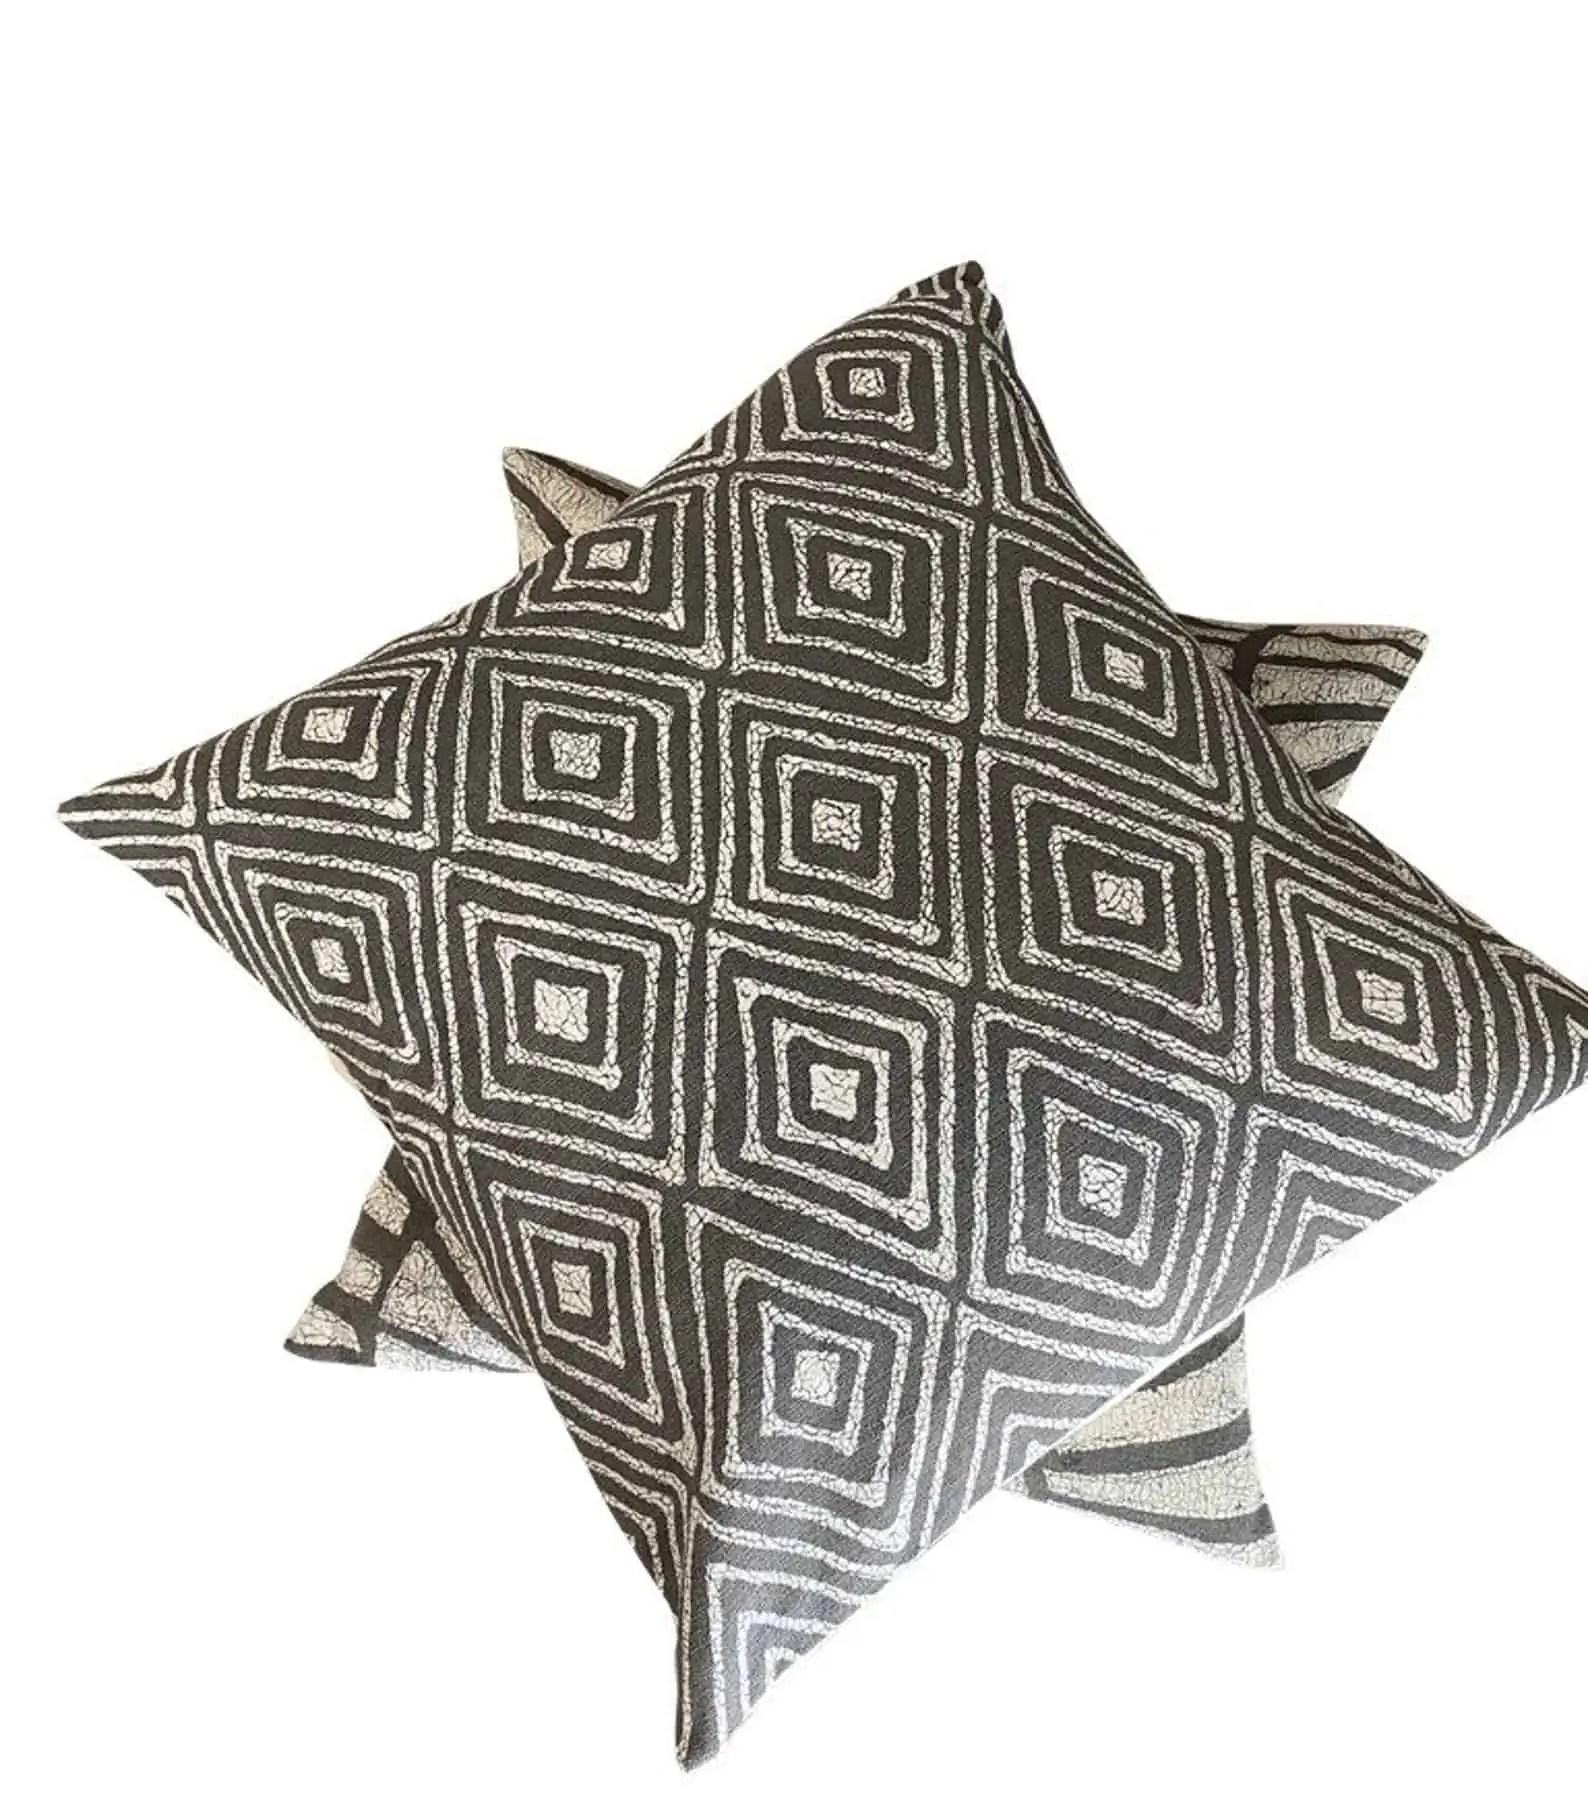 BatiquaGifts Buy Black | Canadian Etsy Shop FairTrade Textiles | African Pillow Cases